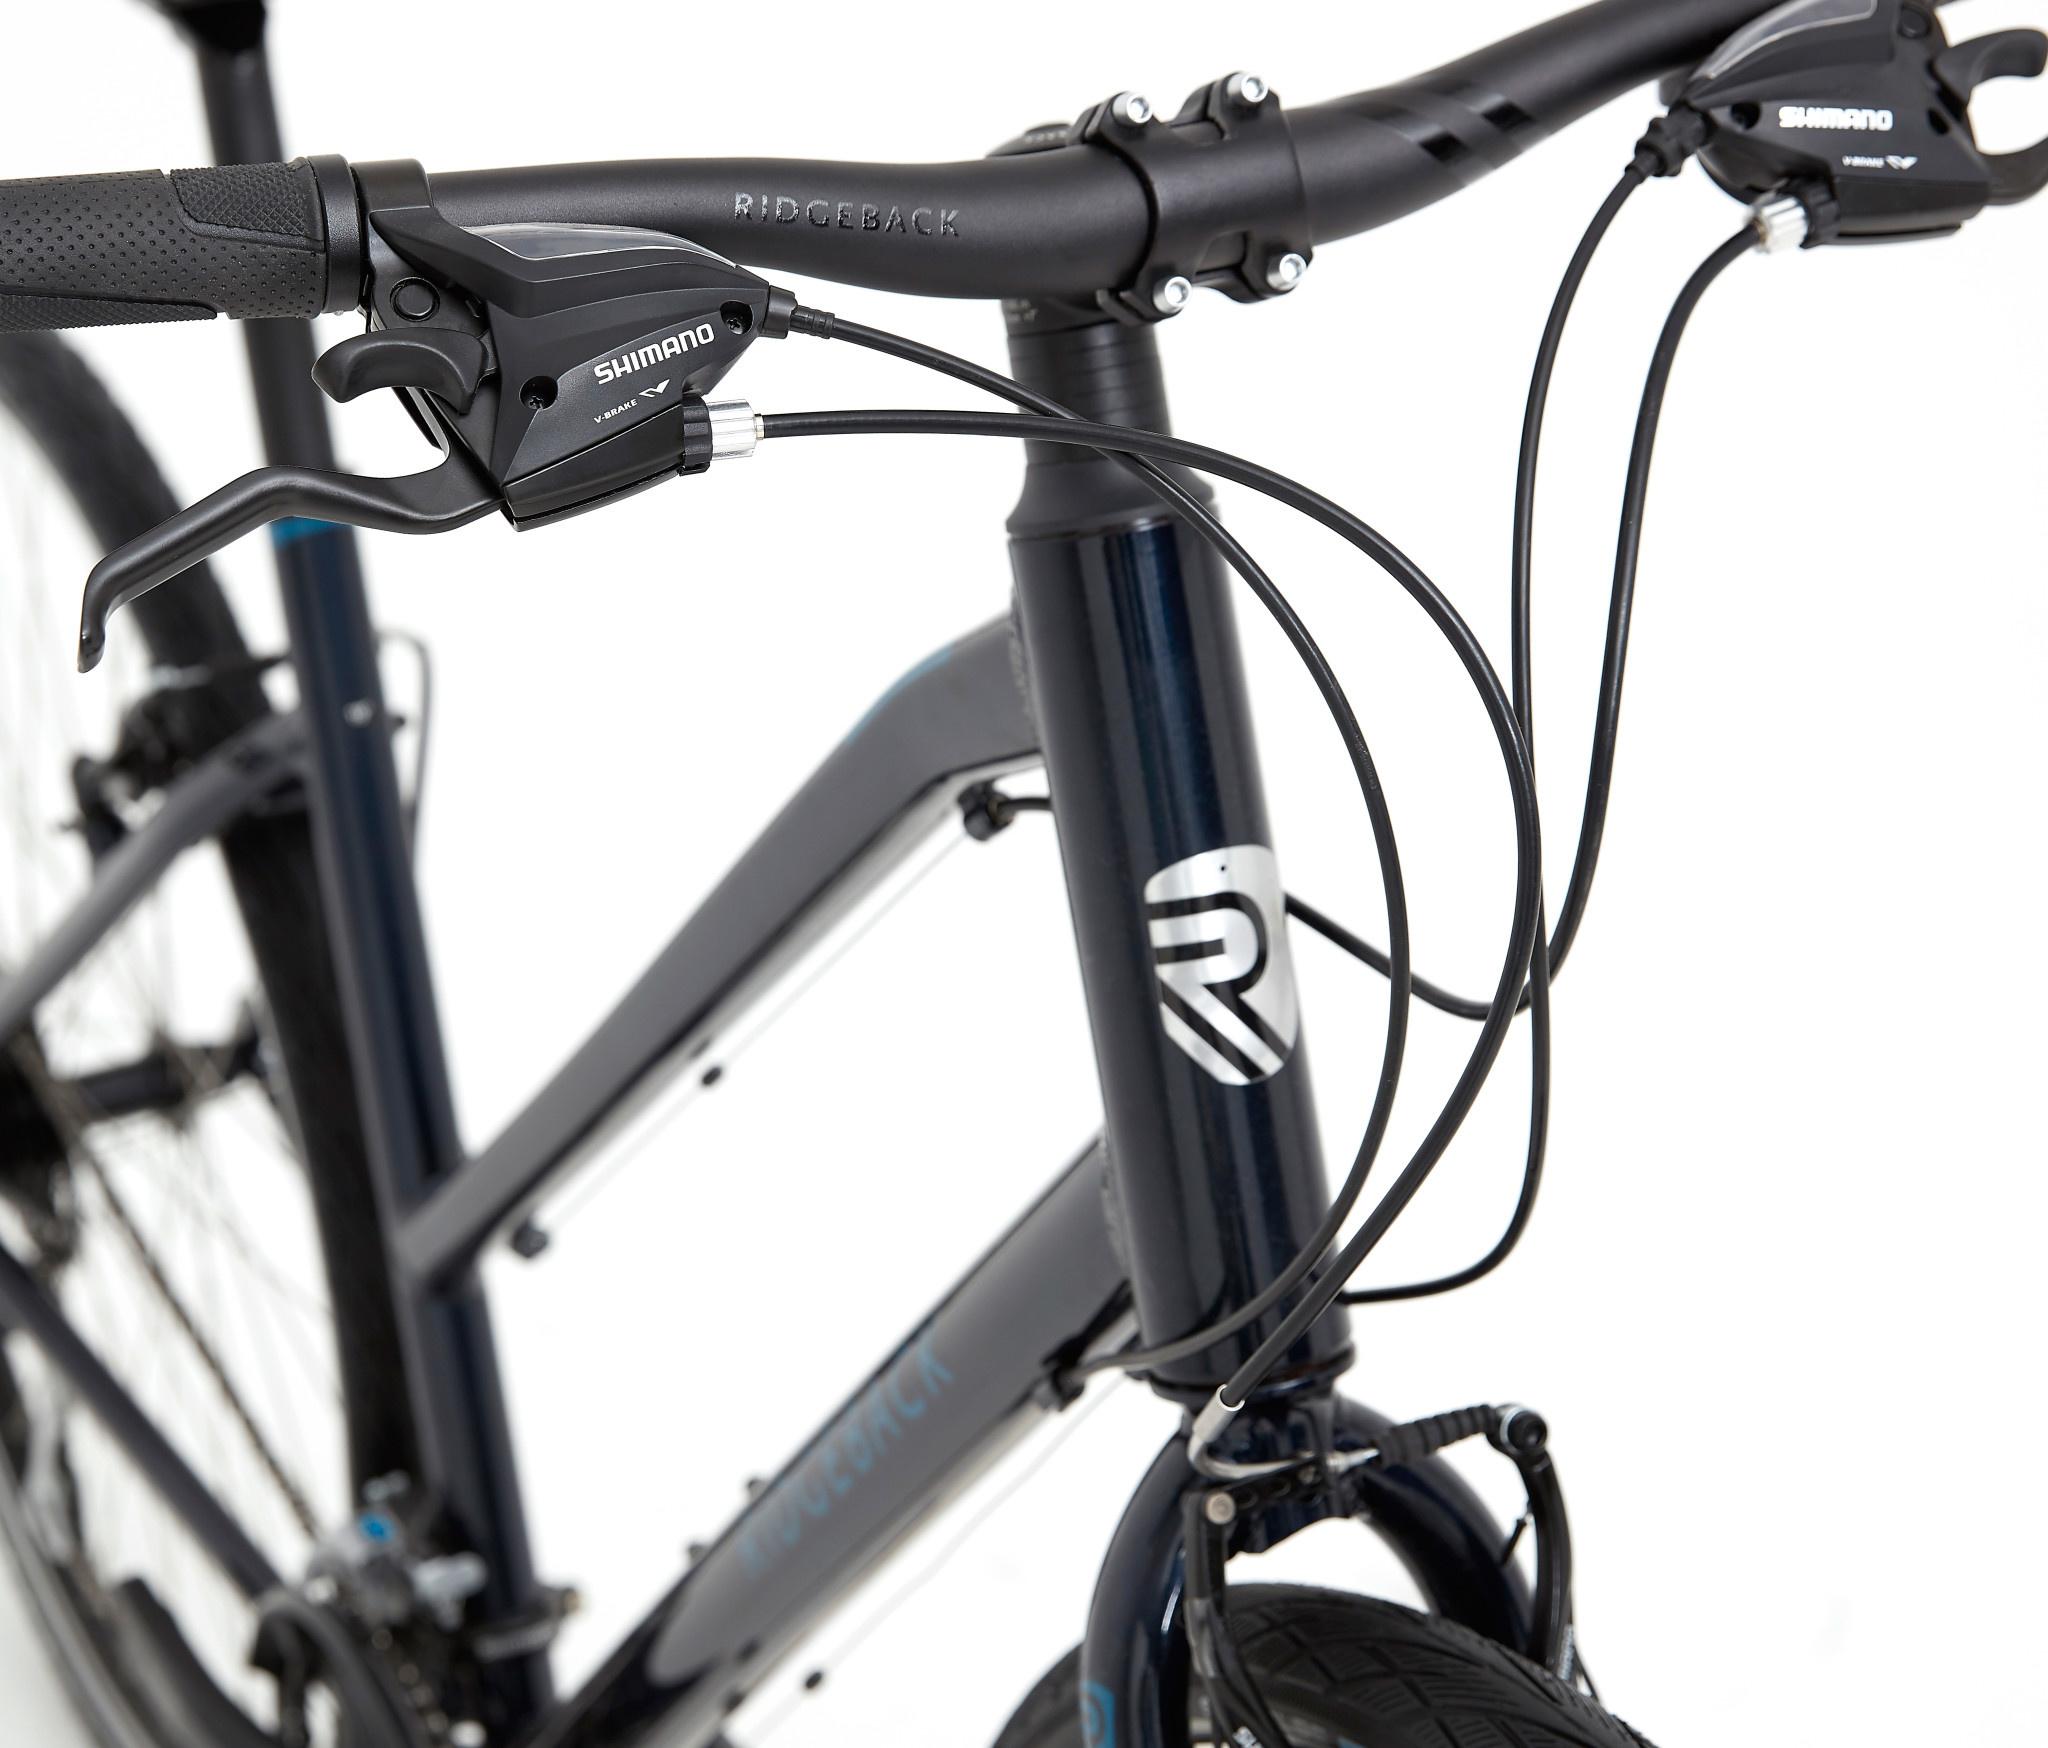 Ridgeback Ridgeback Velocity Open Frame Dark Blue 2019/2020